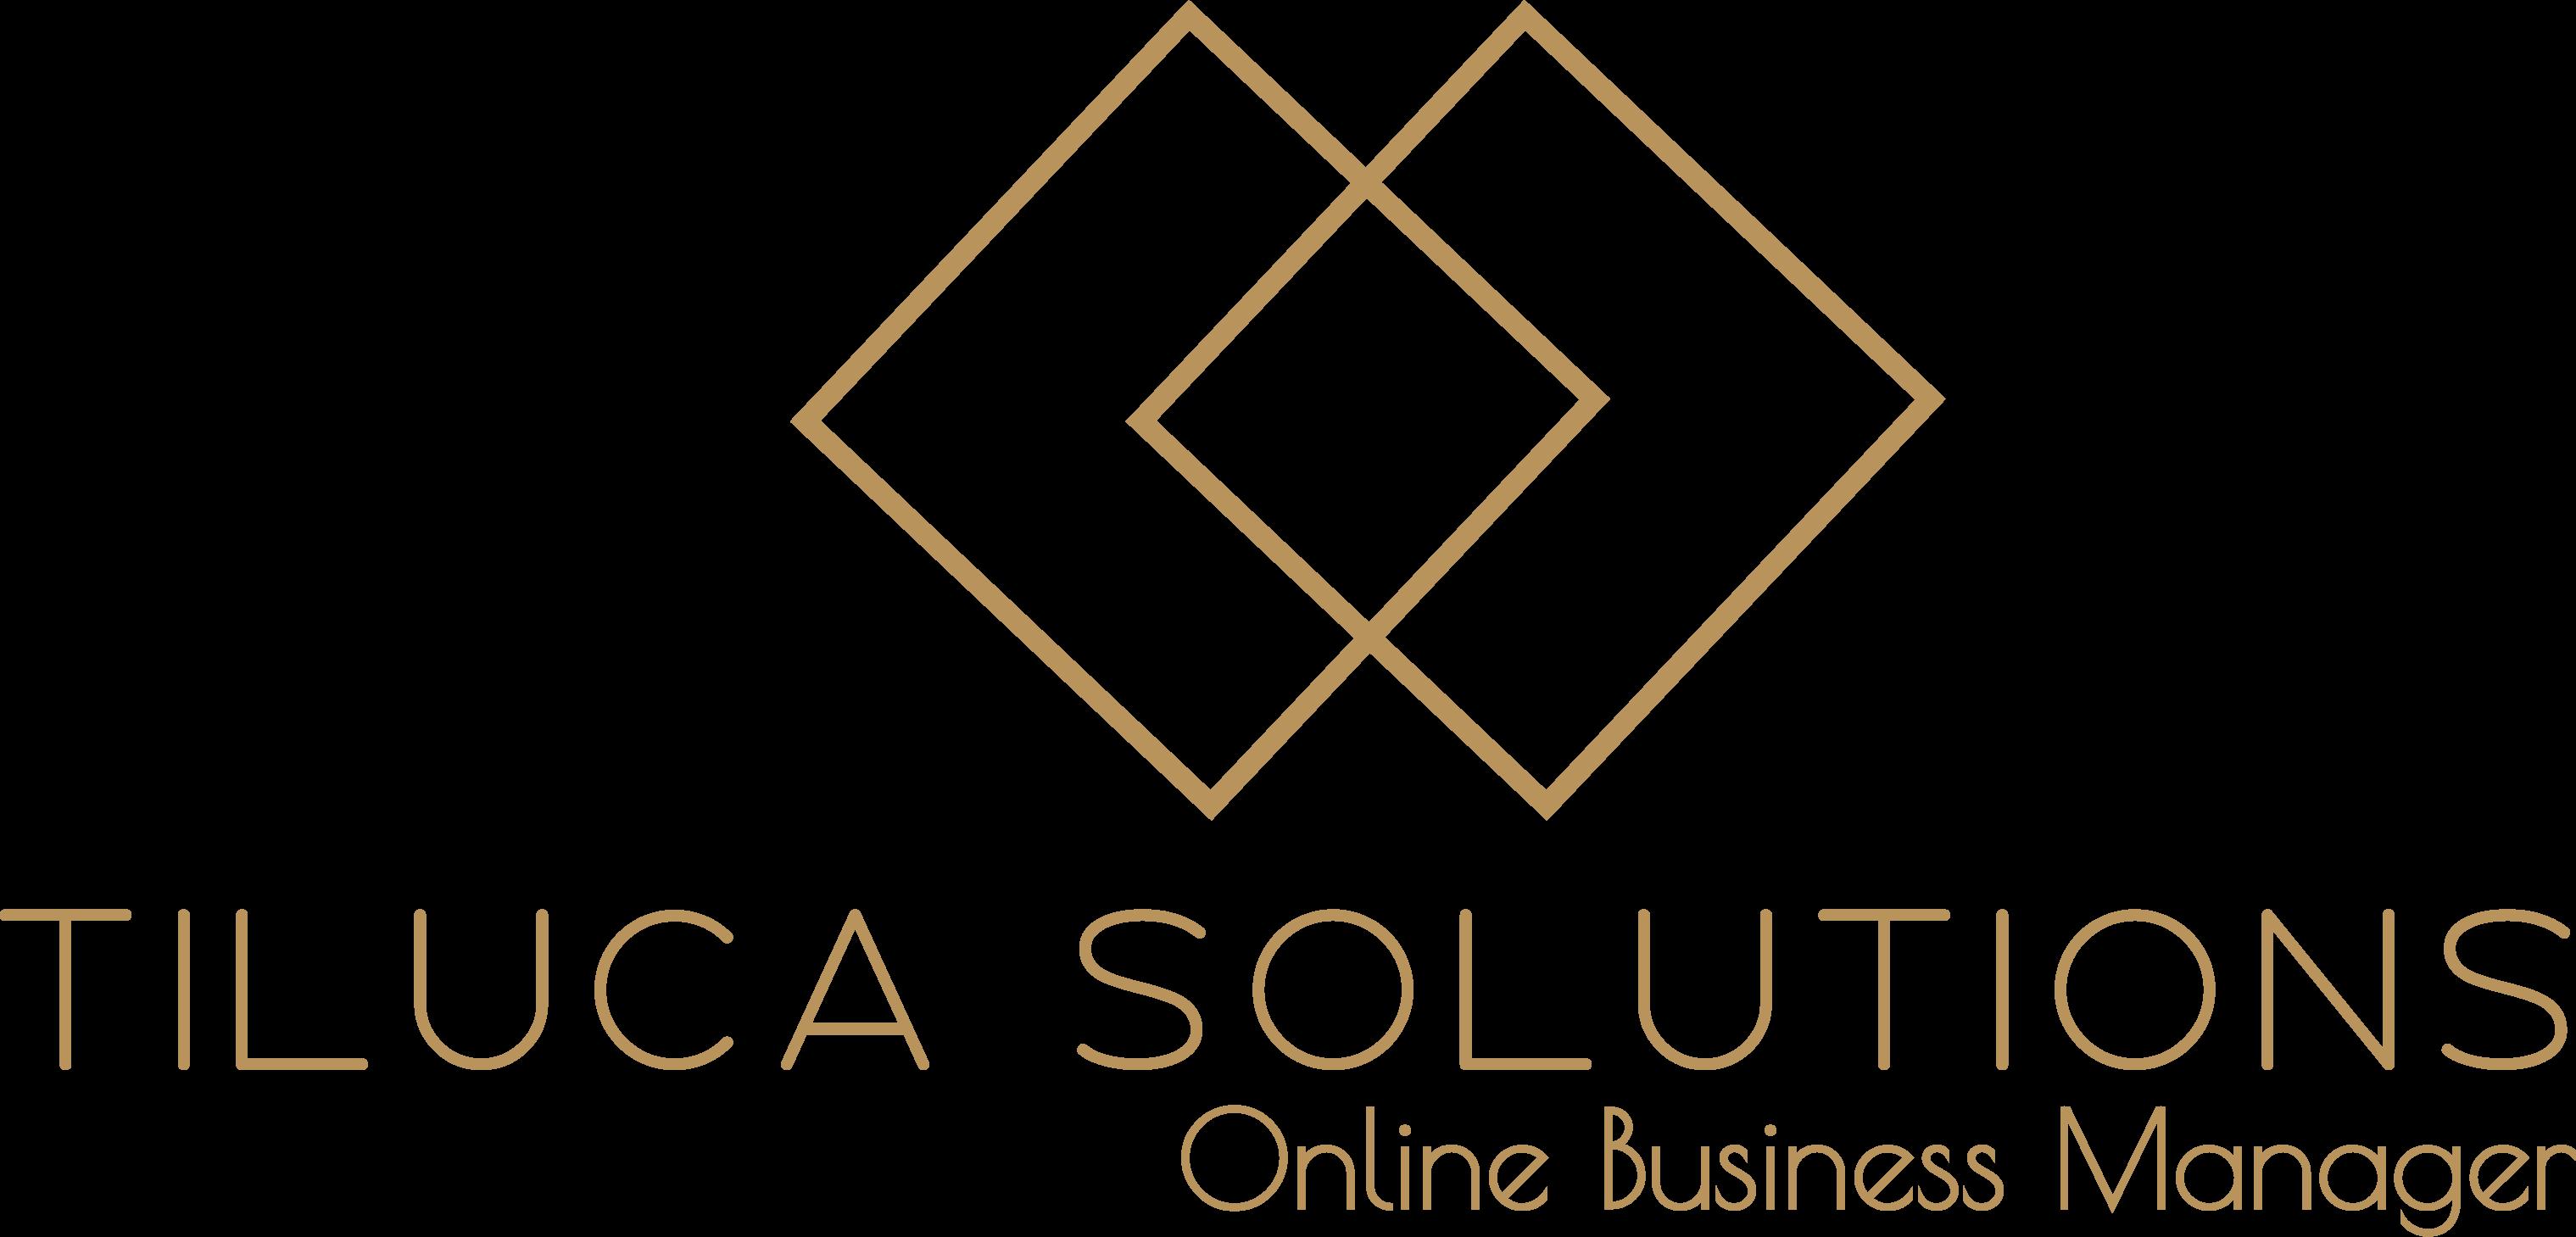 Tiluca Solutions